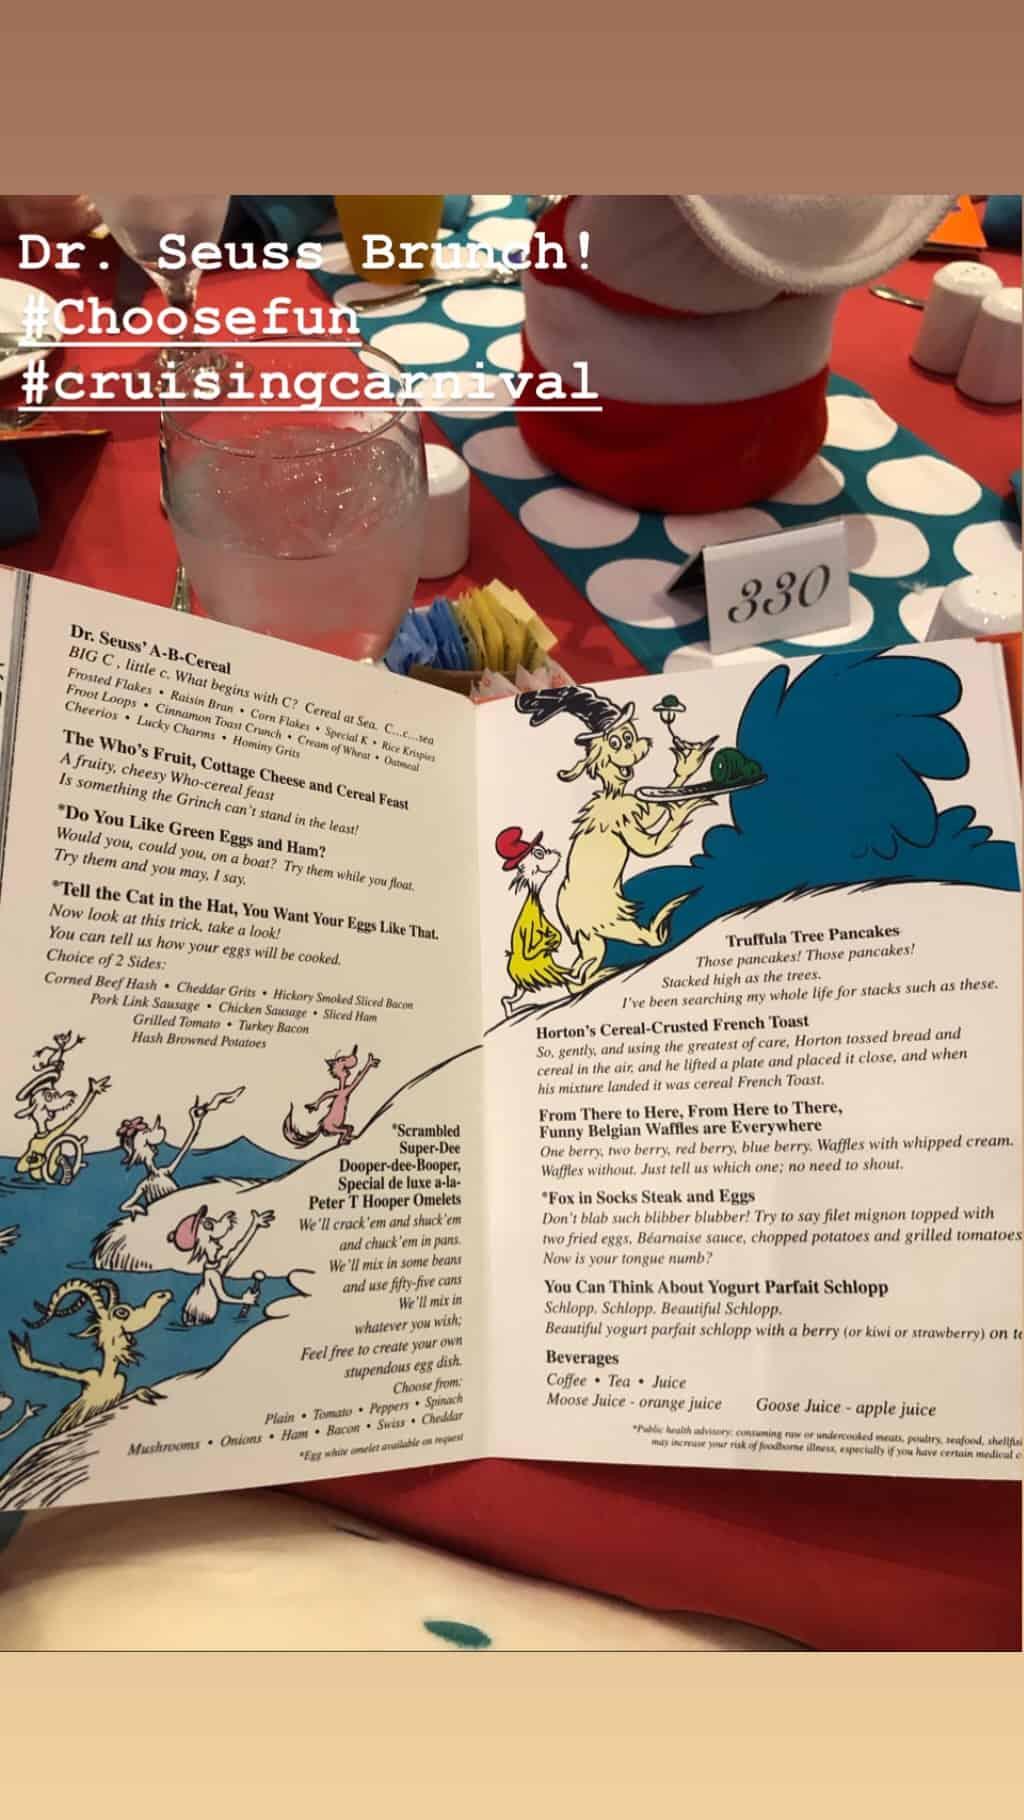 dr. suess brunch menu